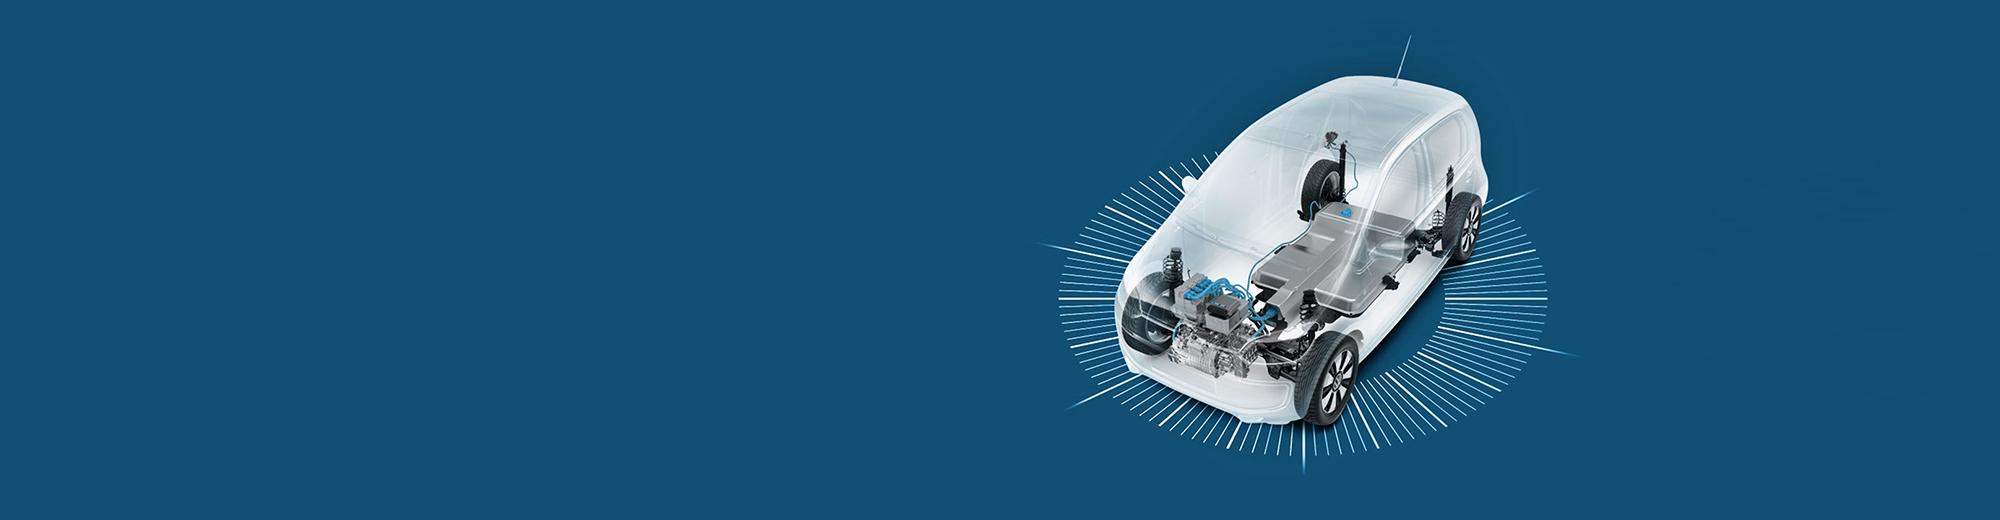 How your Electric Car Works | Volkswagen UK